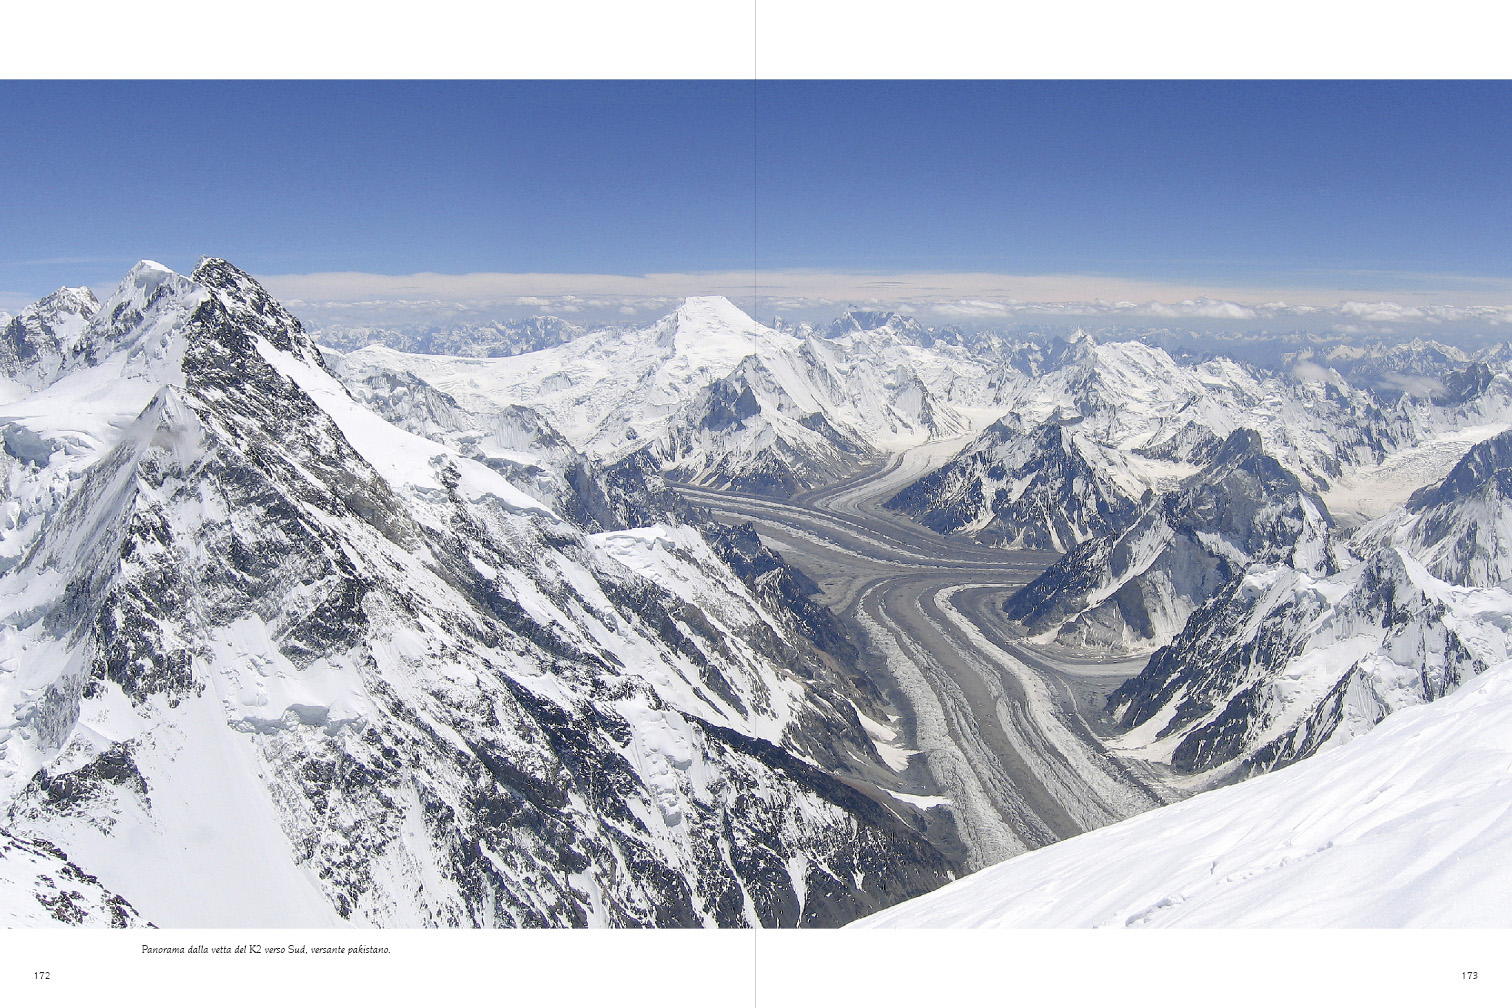 K2 EXPEDITION 1954-2004 Giuseppe Ghedina Fotografo - 088.jpg